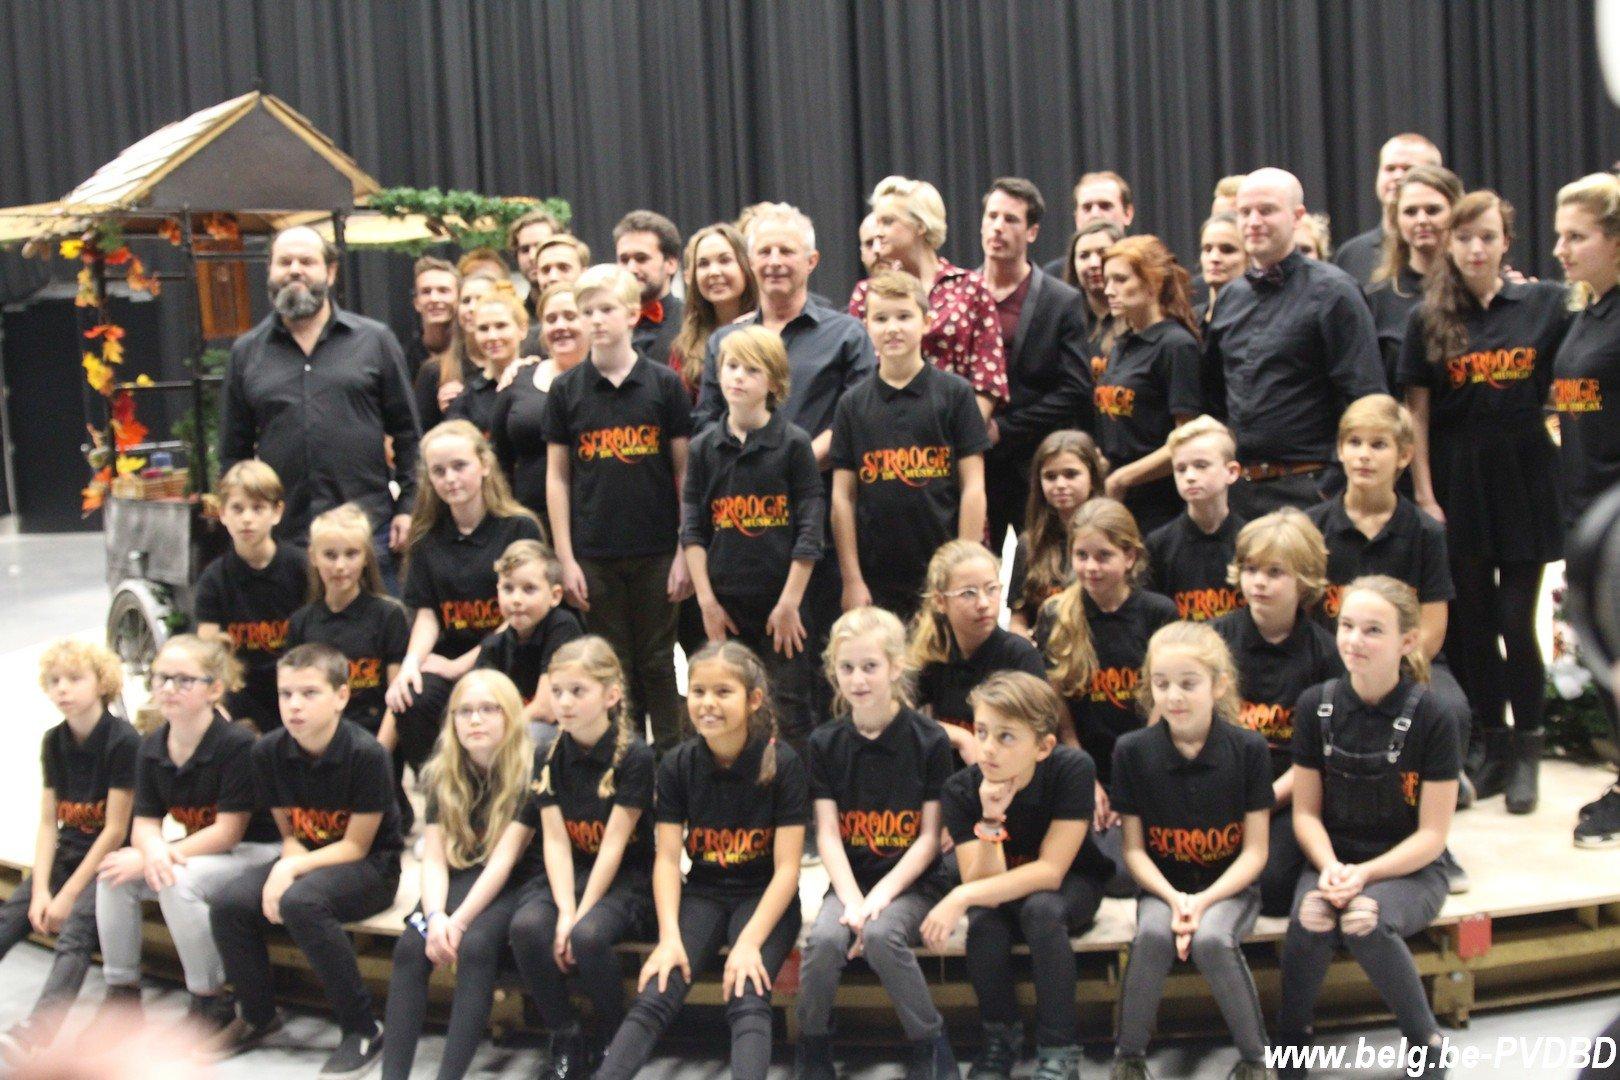 Music Hall voorziet nu al6 extra voorstellingenvan 'Scrooge - IMG 2390